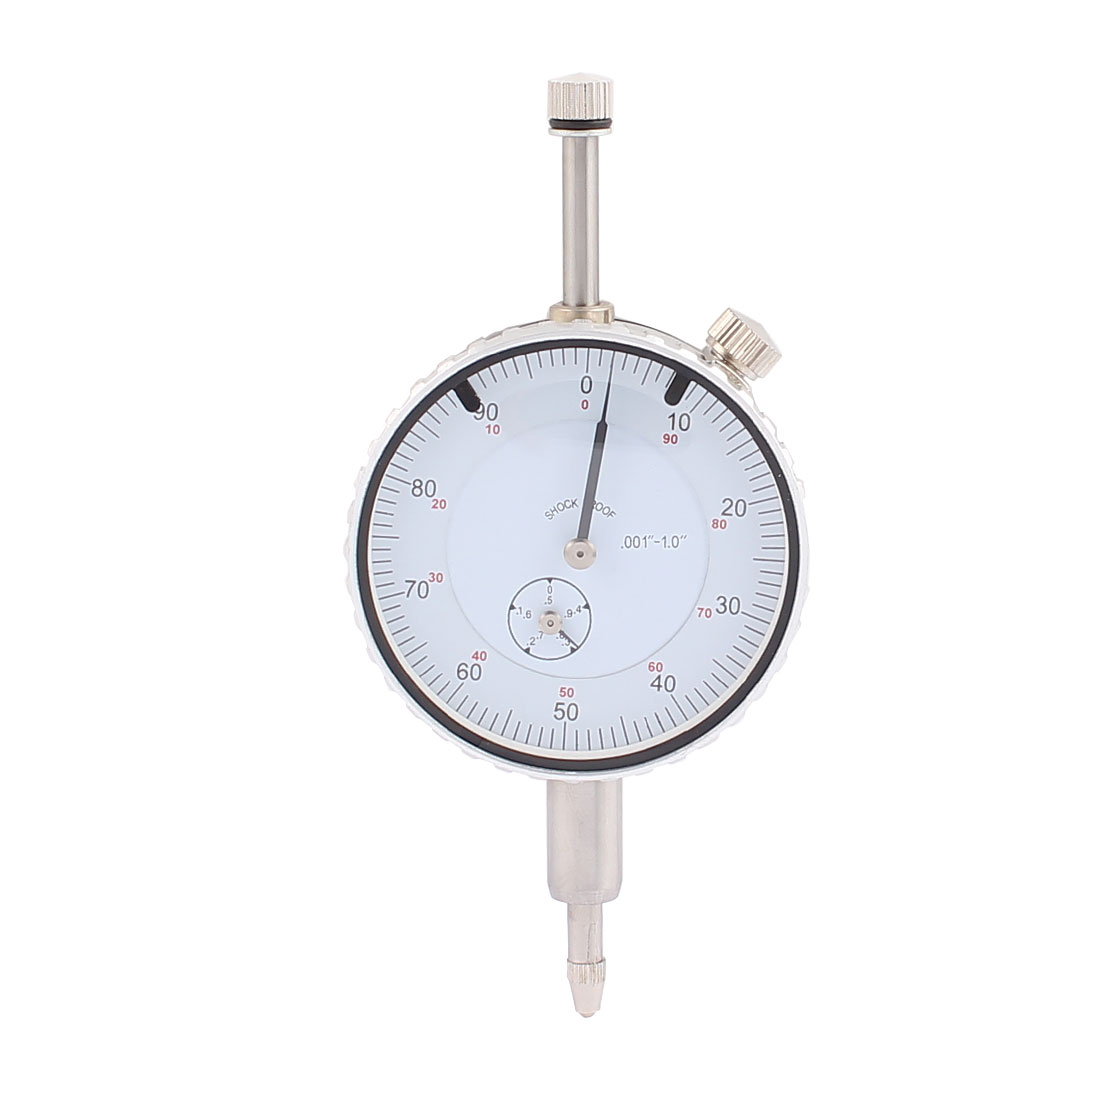 0-1inch Range Measurement Instrument Dial Indicator Gauge Precision Tool B-05